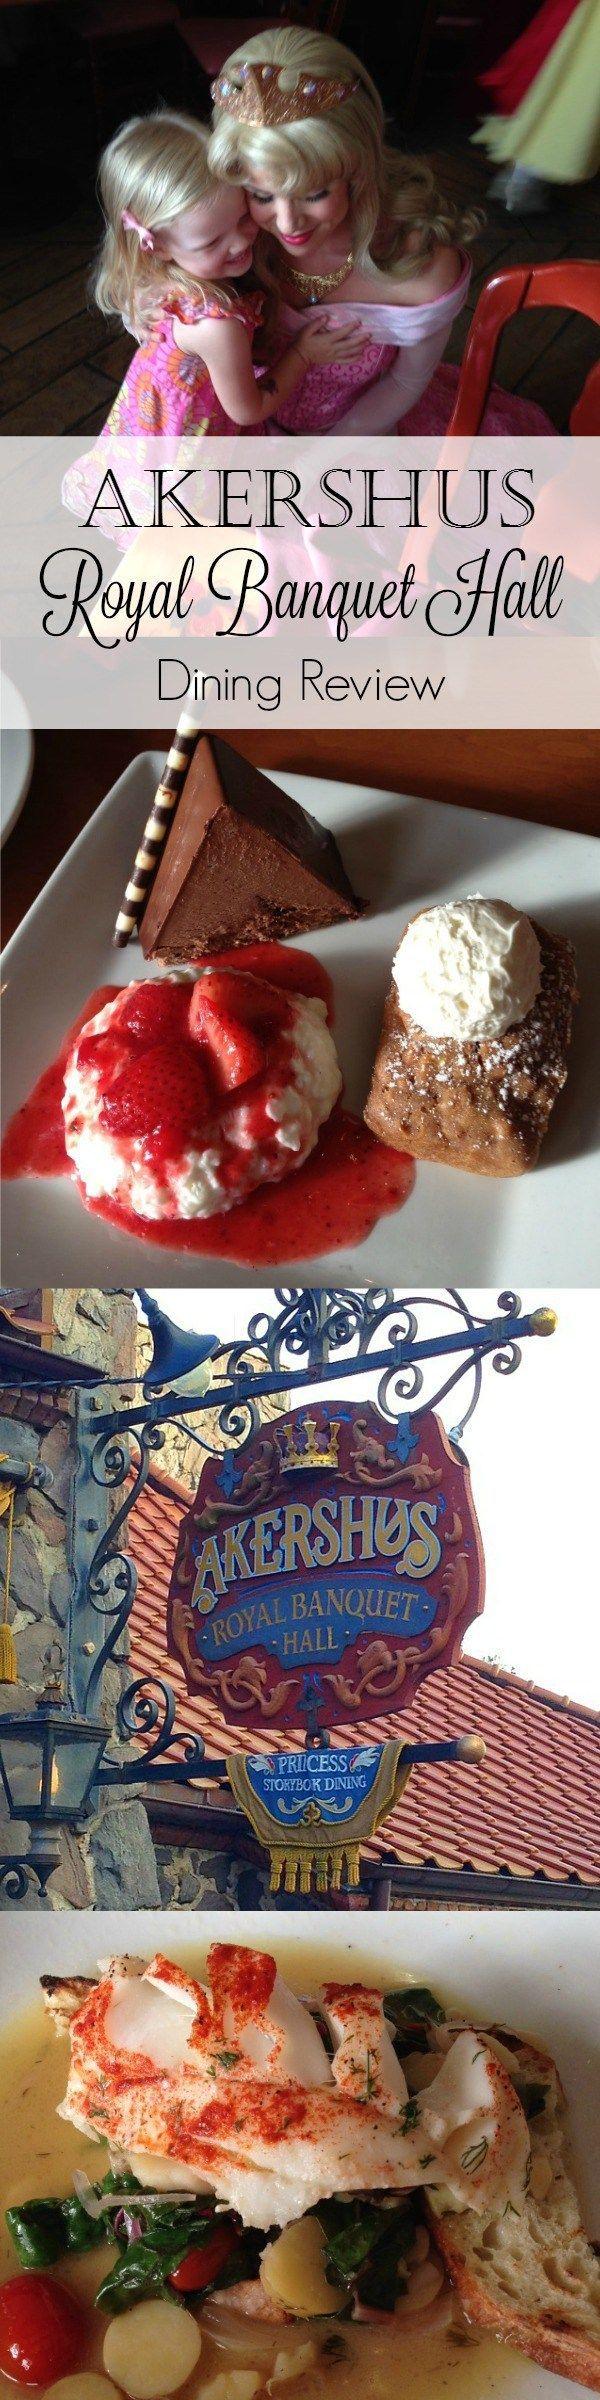 Review of Princess Storybook Dining at Disney's Akershus Royal Banquet Hall in Epcot's Norway pavilion